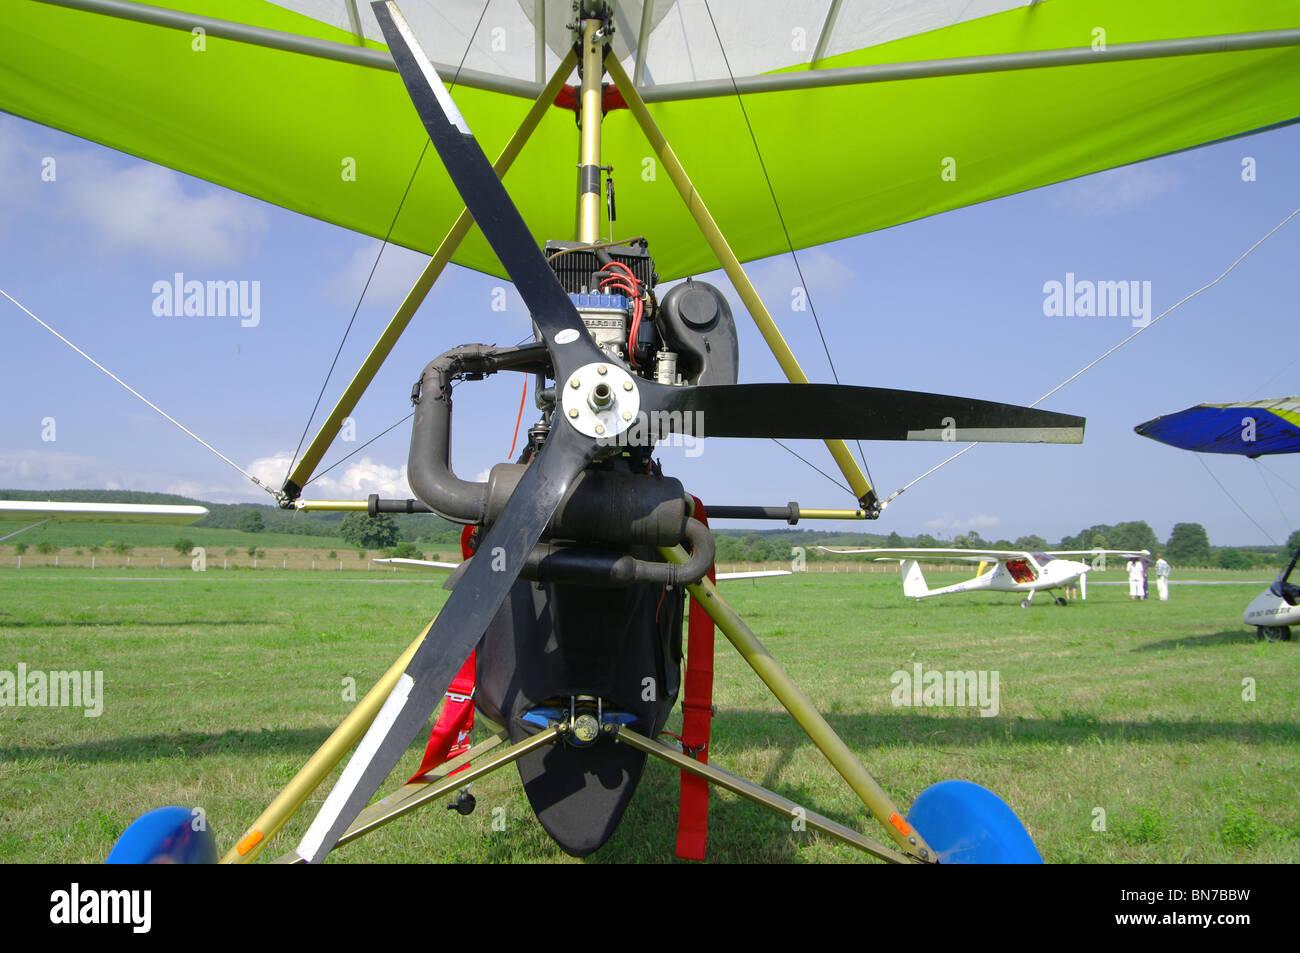 motor gliders propeller - Stock Image